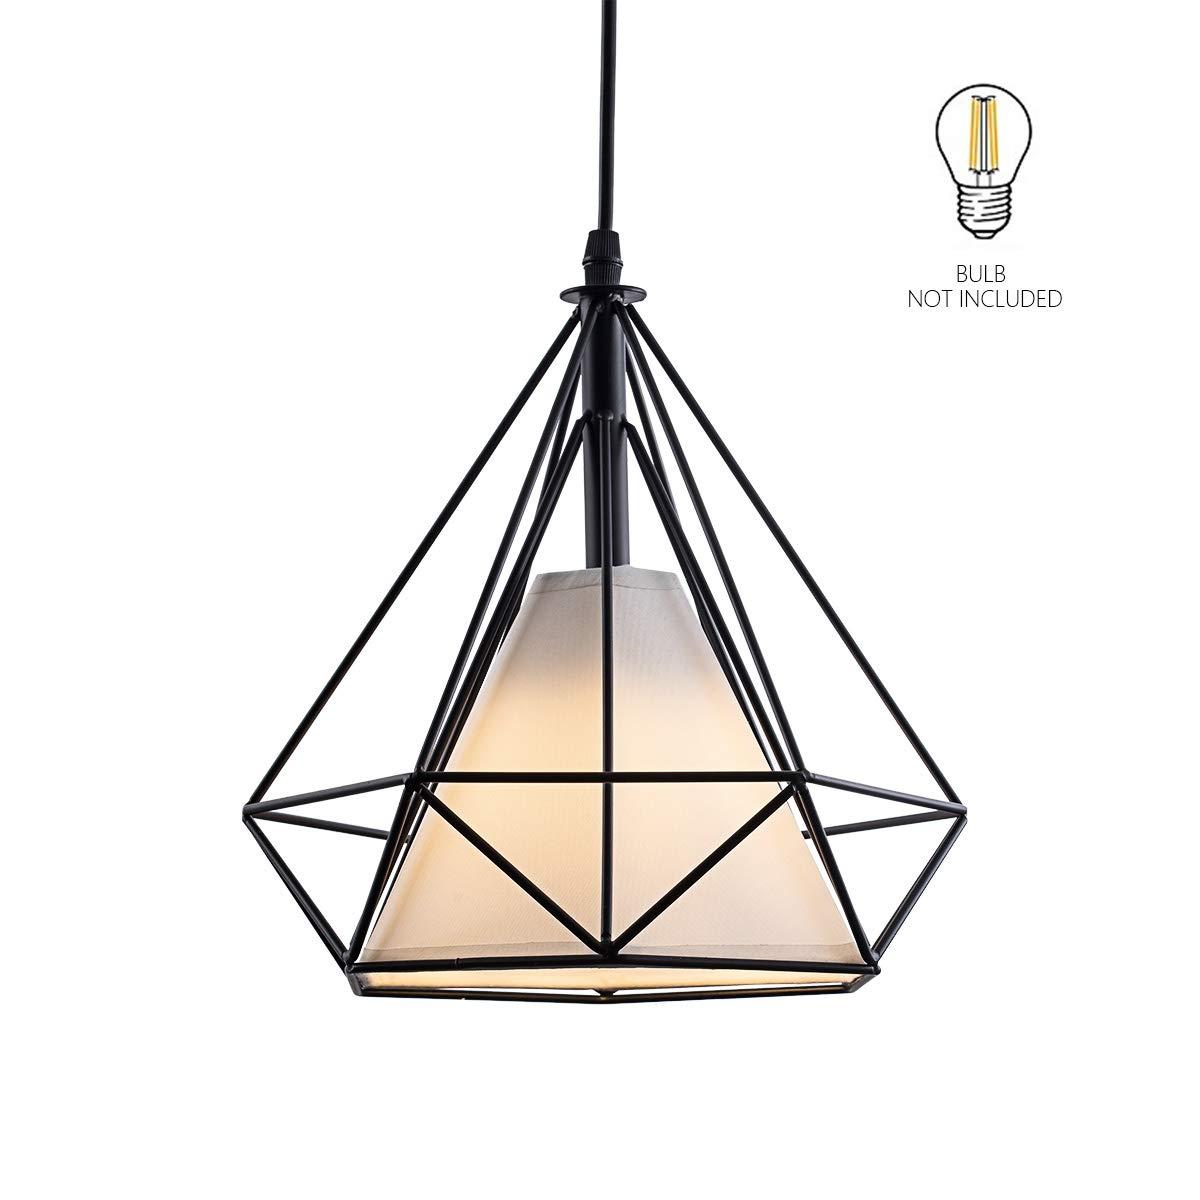 HOGOL Modern Geometric Pendant Lighting, Adjustable Wire Iron Diamond Shade Light Fixture for Kitchen Island Dining Room Hallway